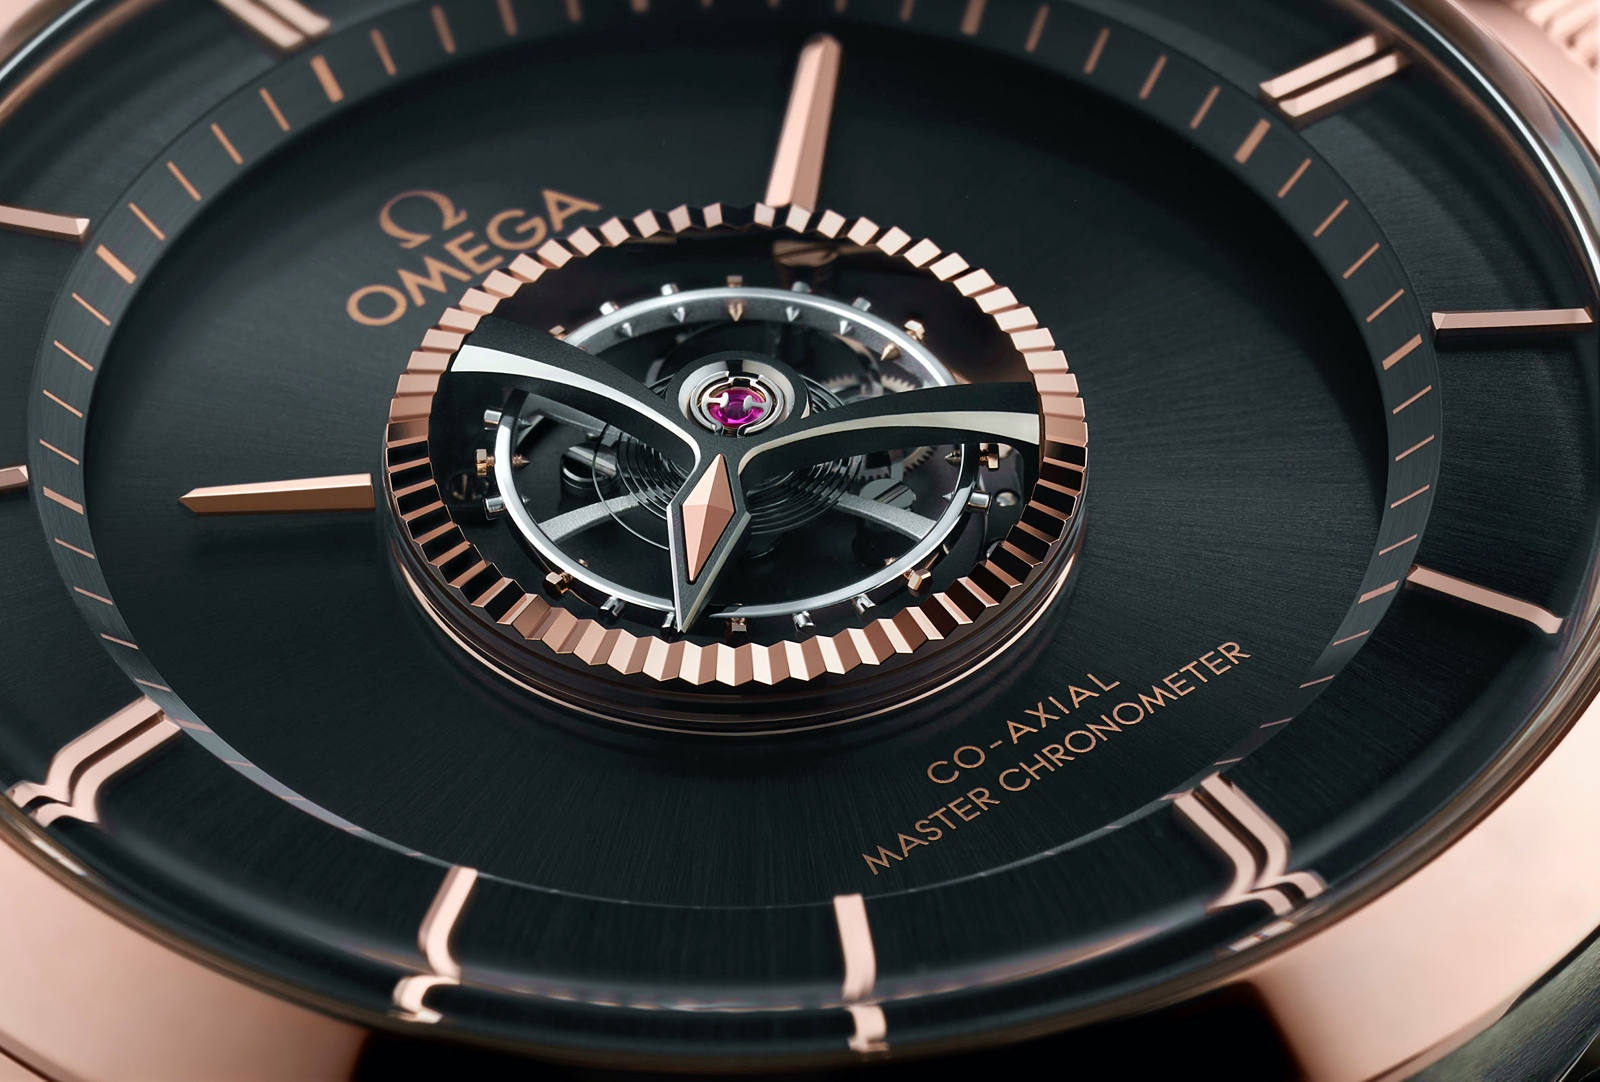 Omega De Ville Tourbillon Master Chronometer - dial